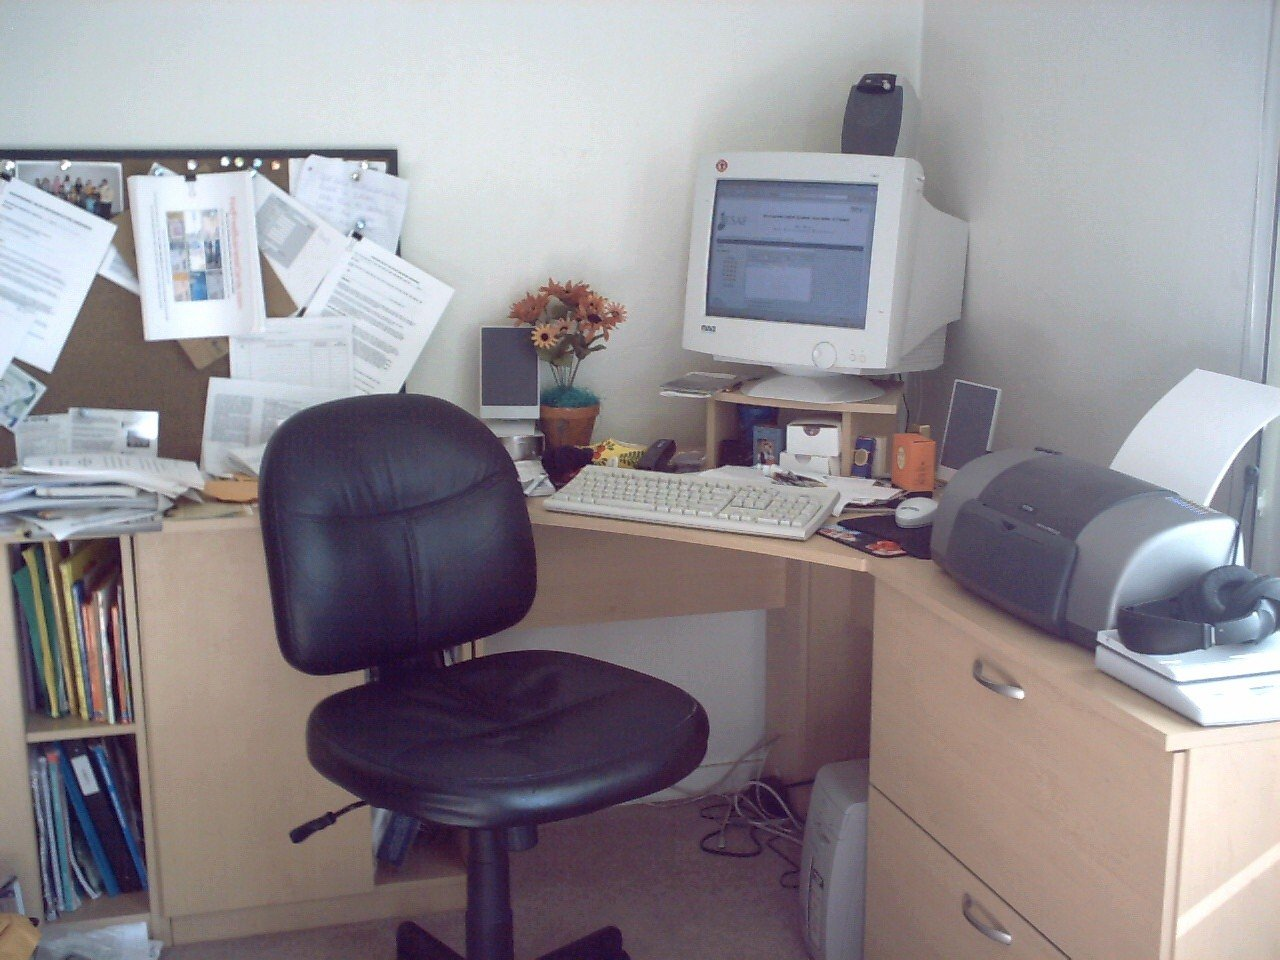 A neat desk